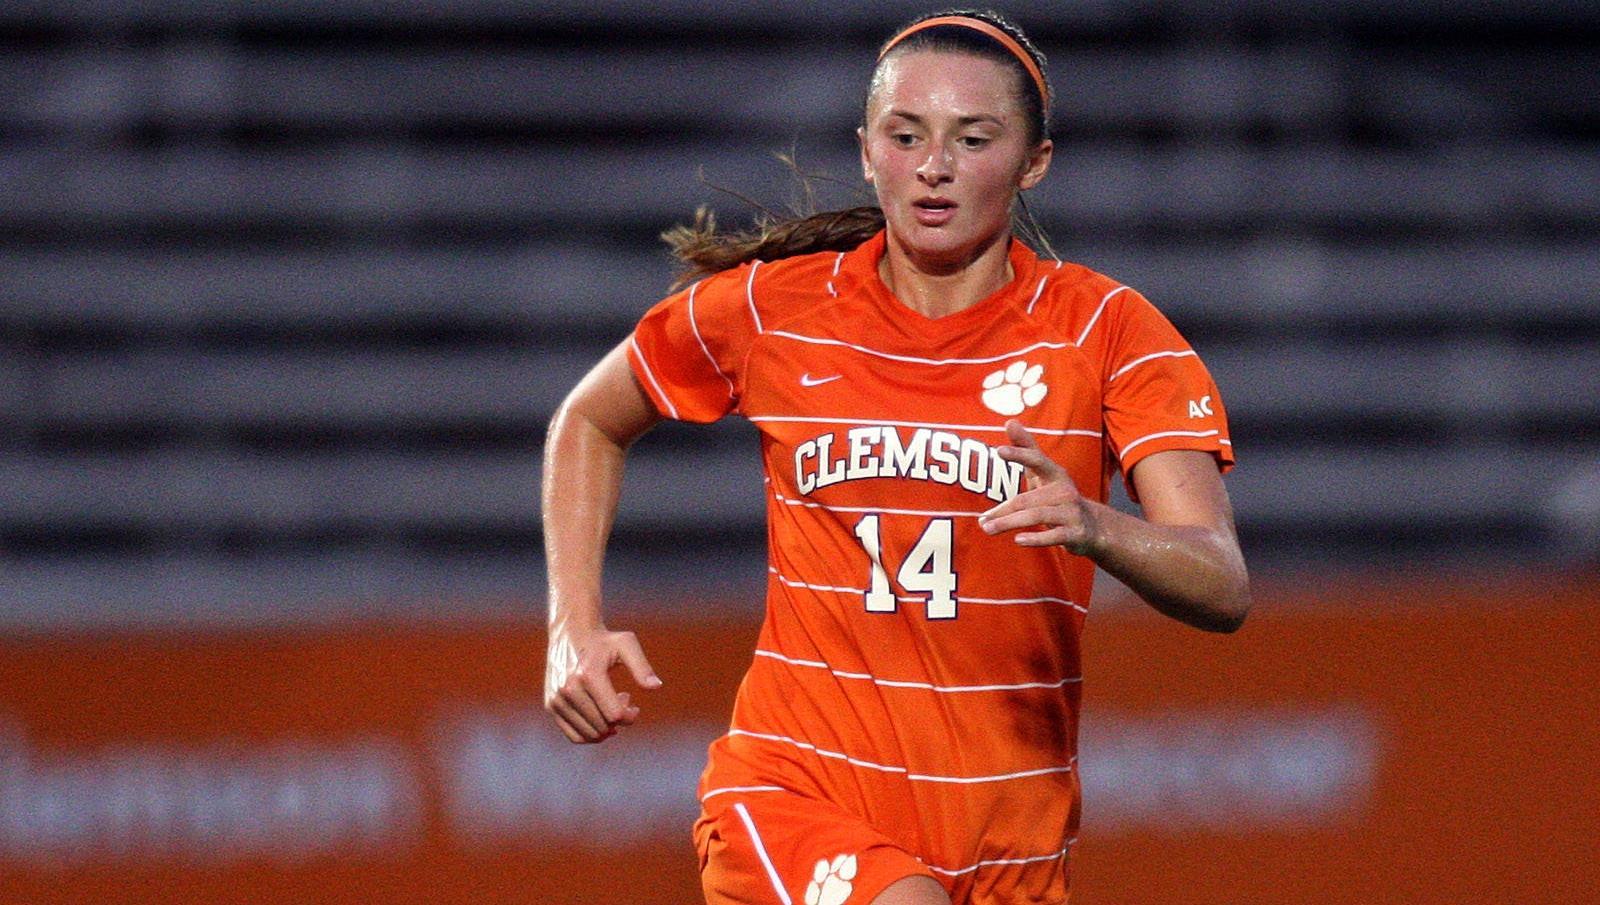 Clemson Women's Soccer Team Opens 2012 Season with Win over Appalachian State